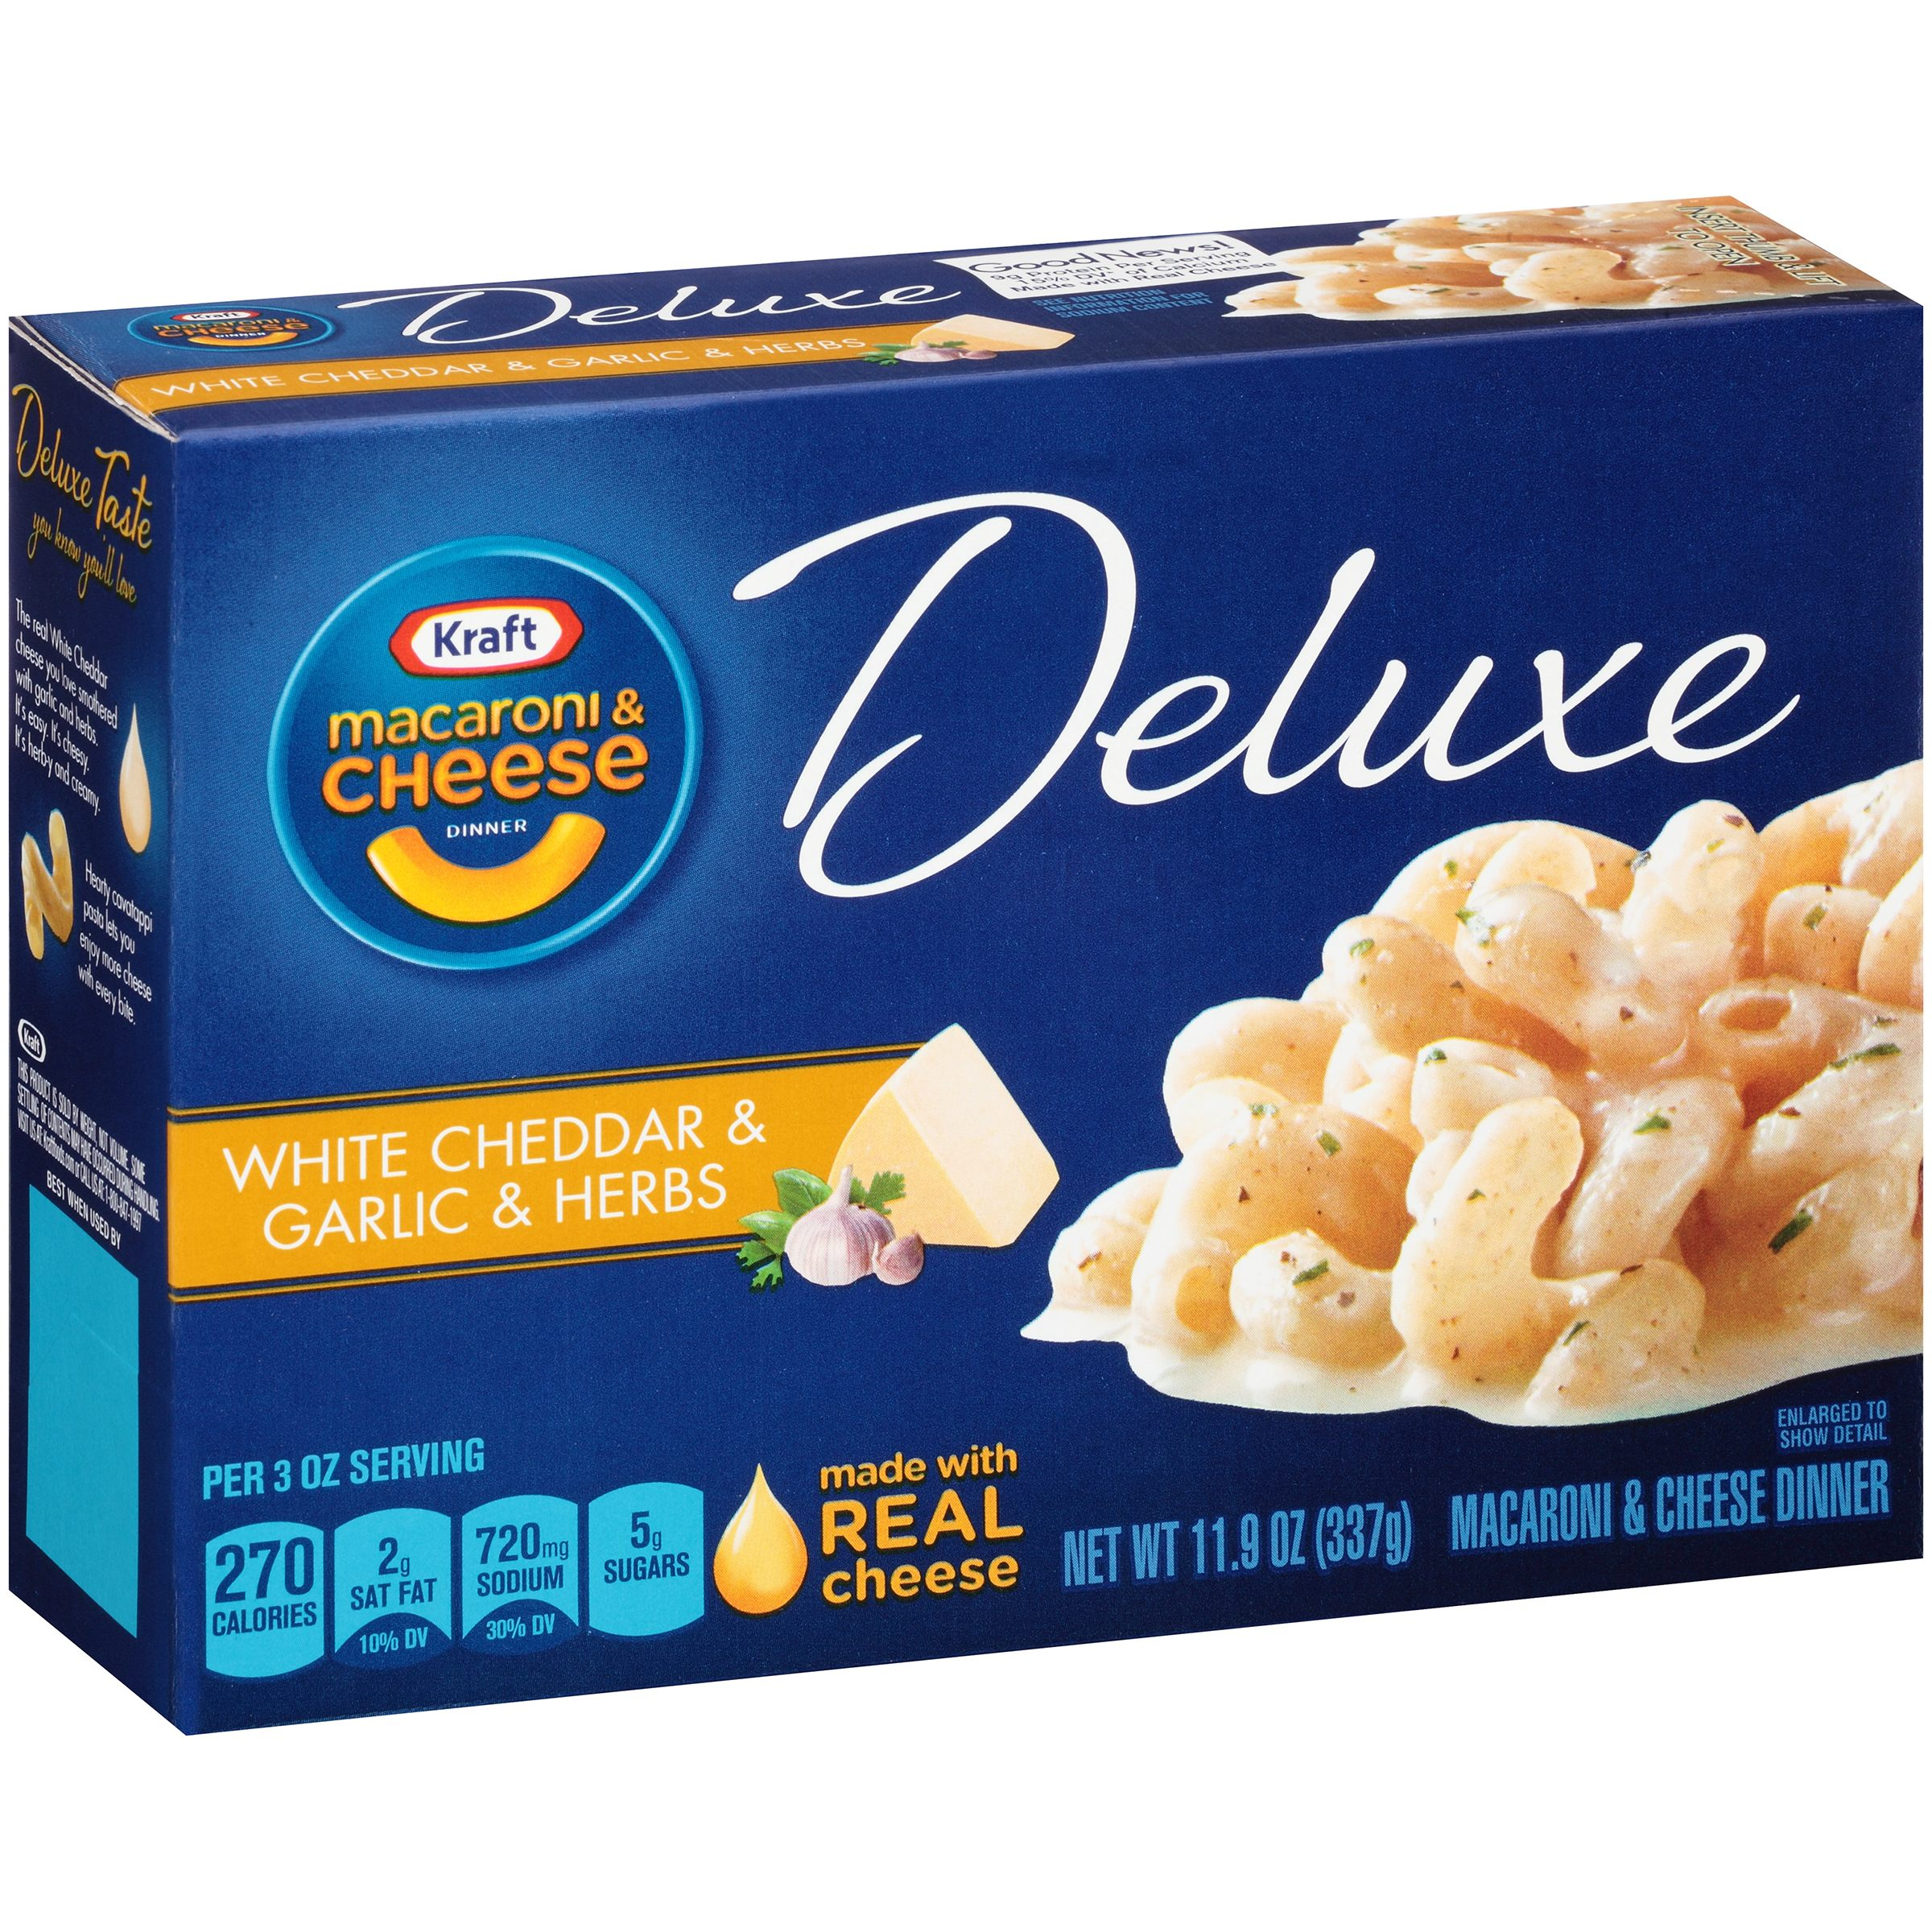 Kraft Macaroni & Cheese Dinner Deluxe White Cheddar, Garlic, Herbs, 11.9 OZ (337g) Box by Kraft Foods Group, Inc.